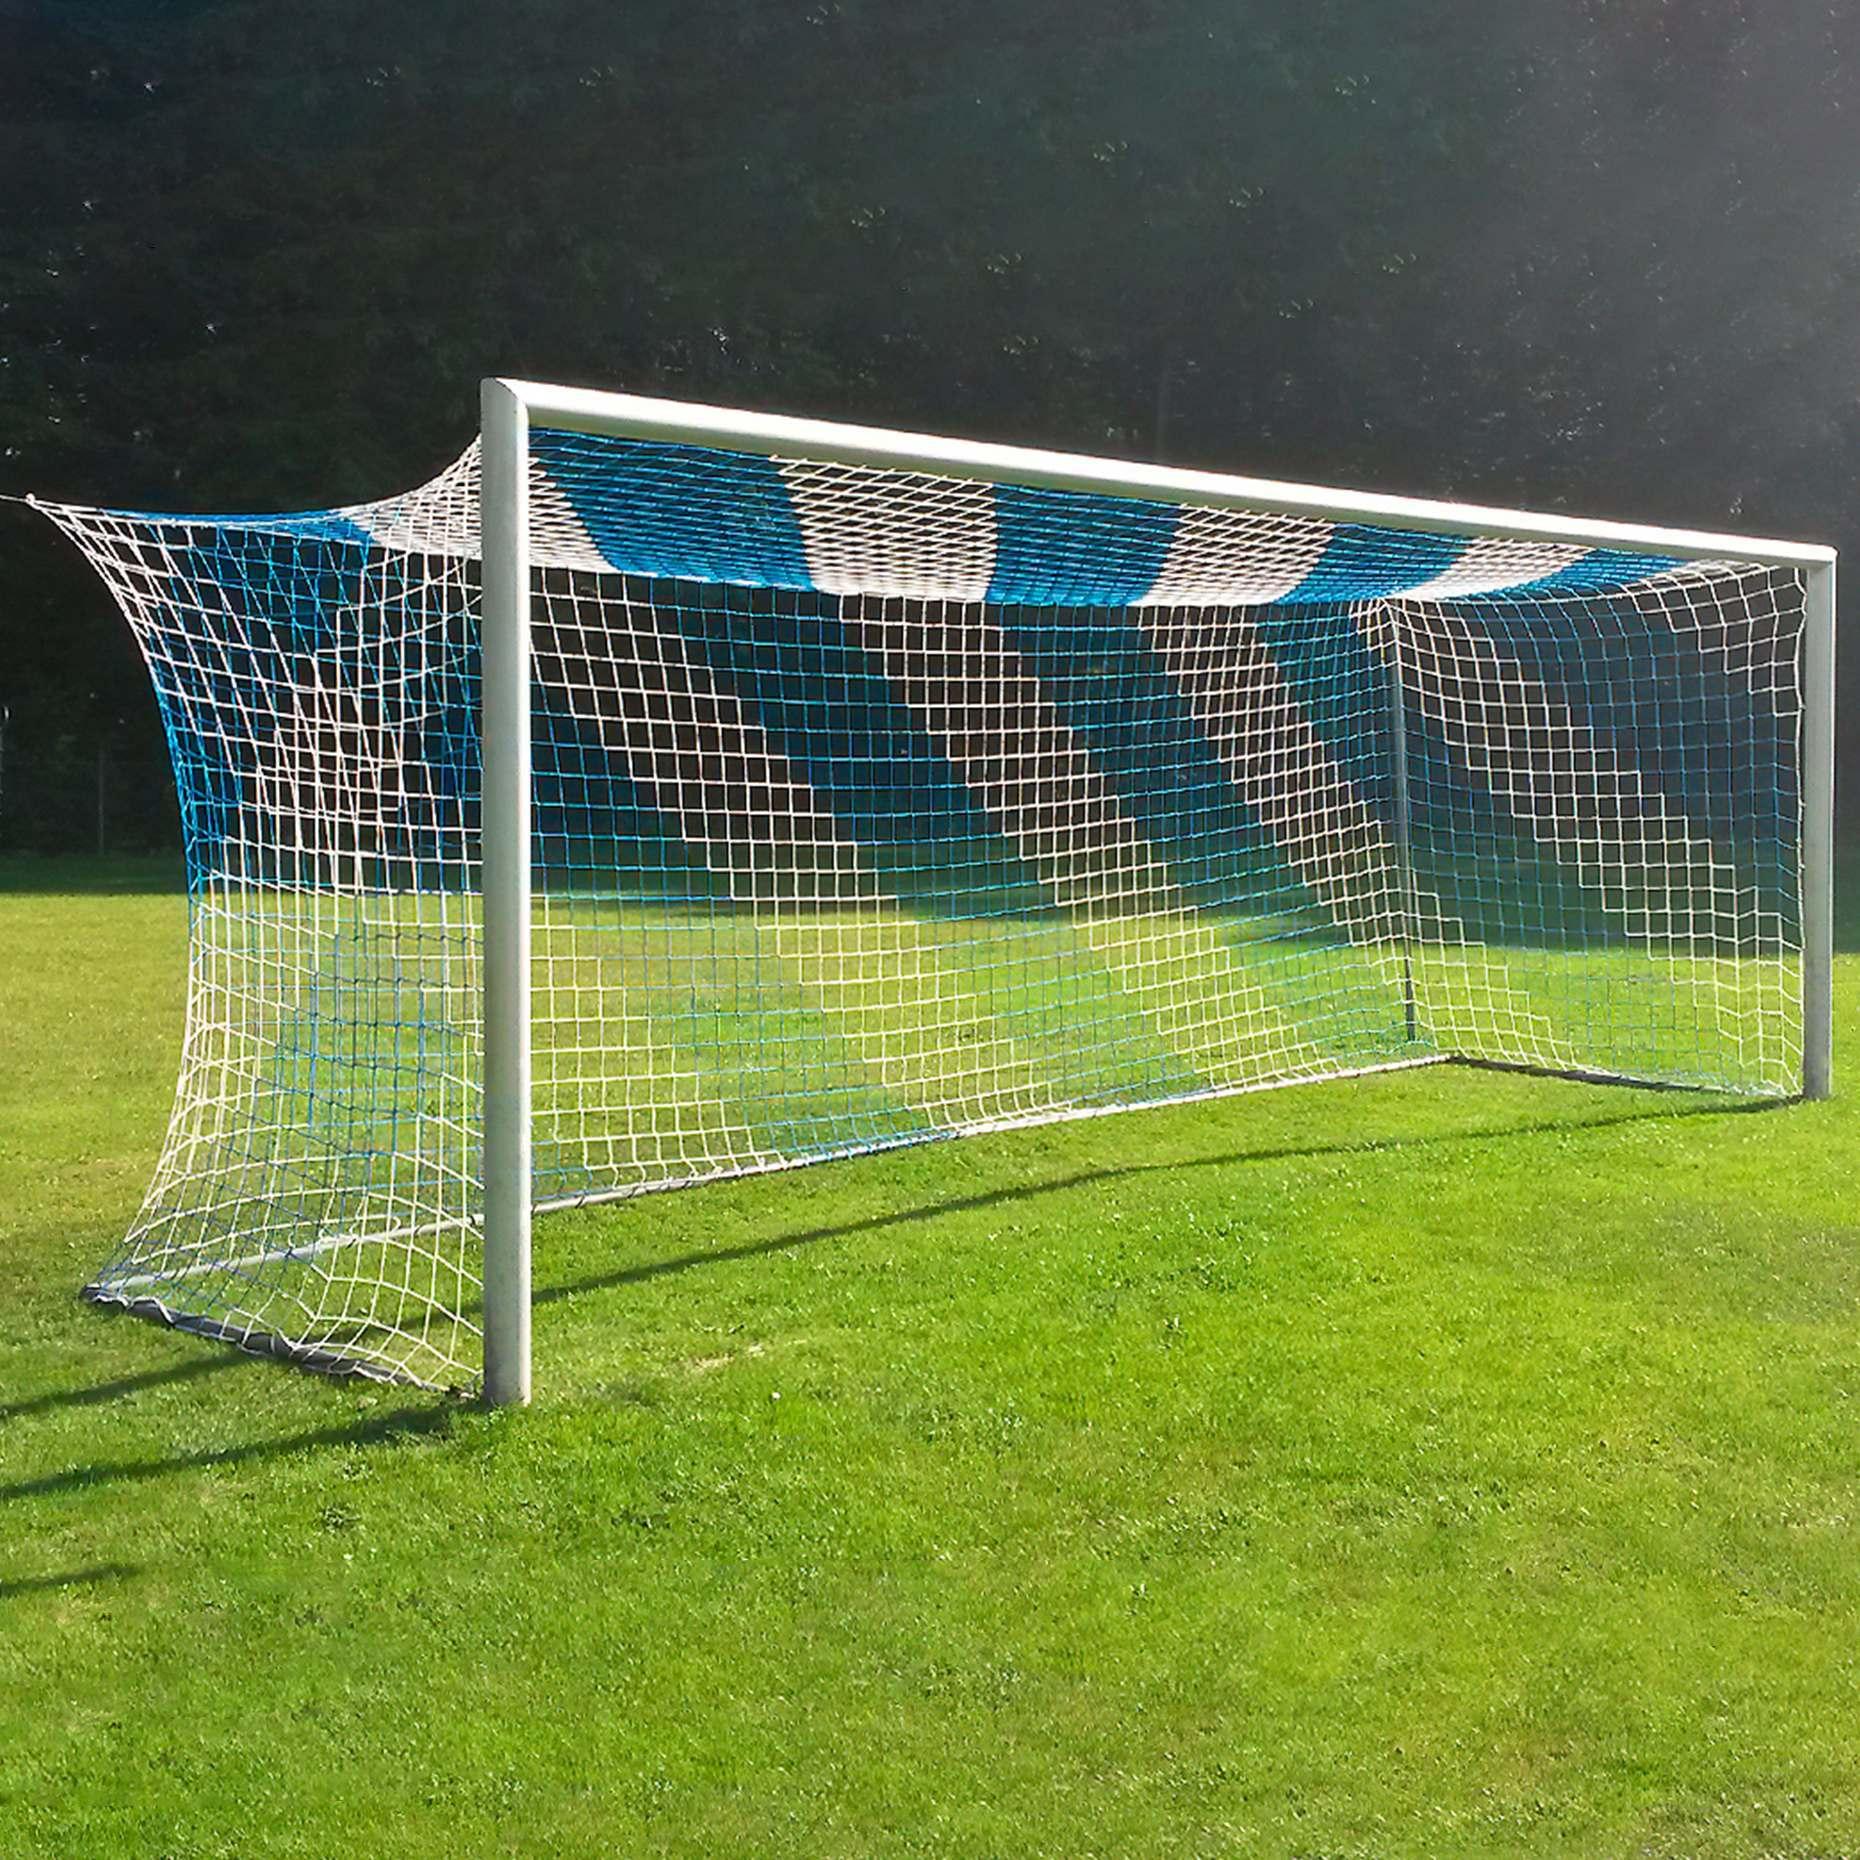 stadium box soccer goal nets net world sports